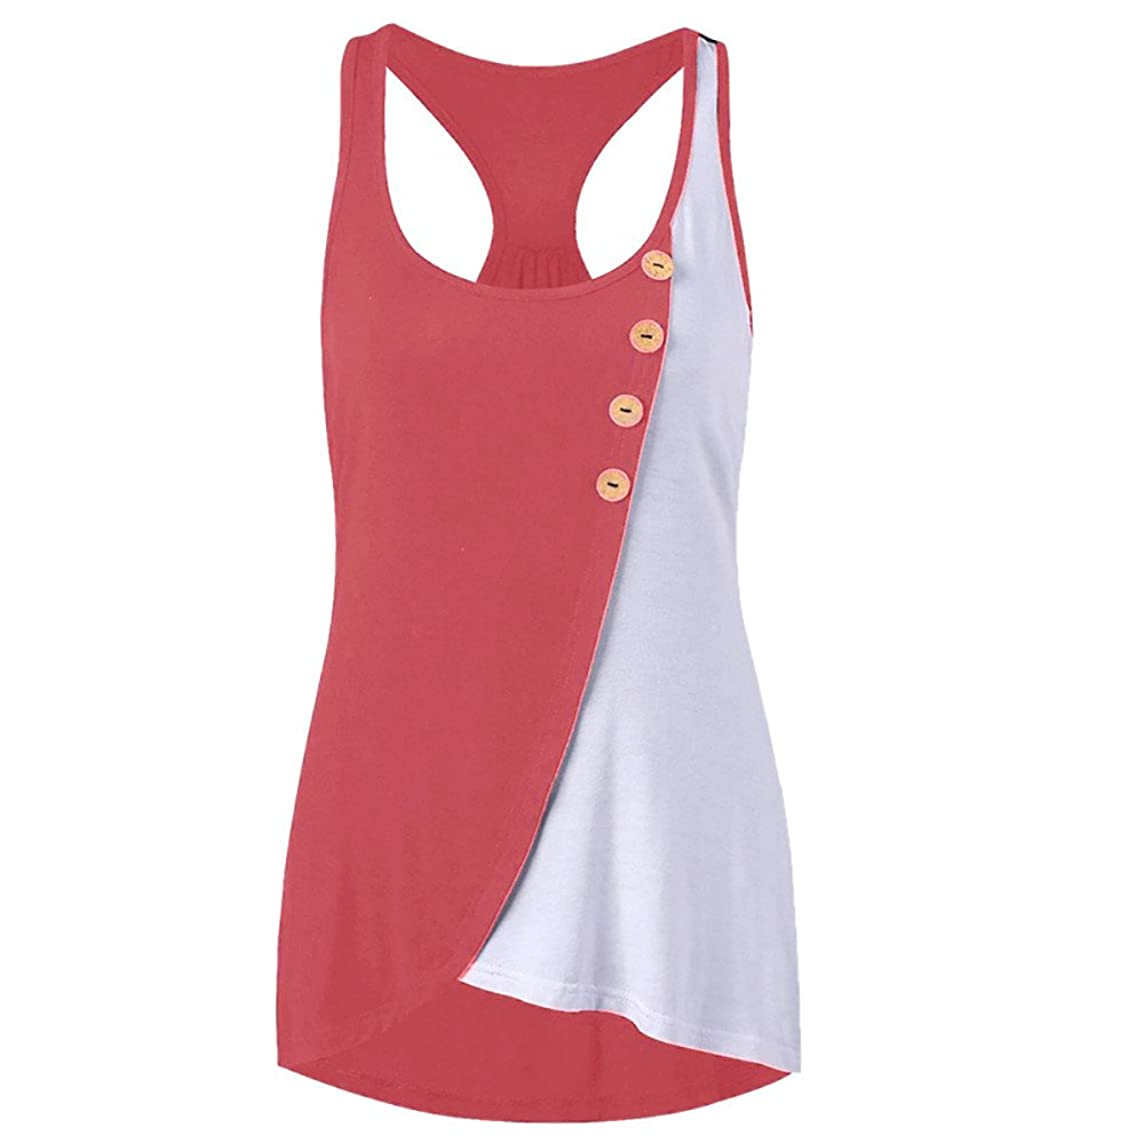 Women Casual Button Top Racer Back Patchwork T Shirt Sleeveless Vest Cami Tank Blouse